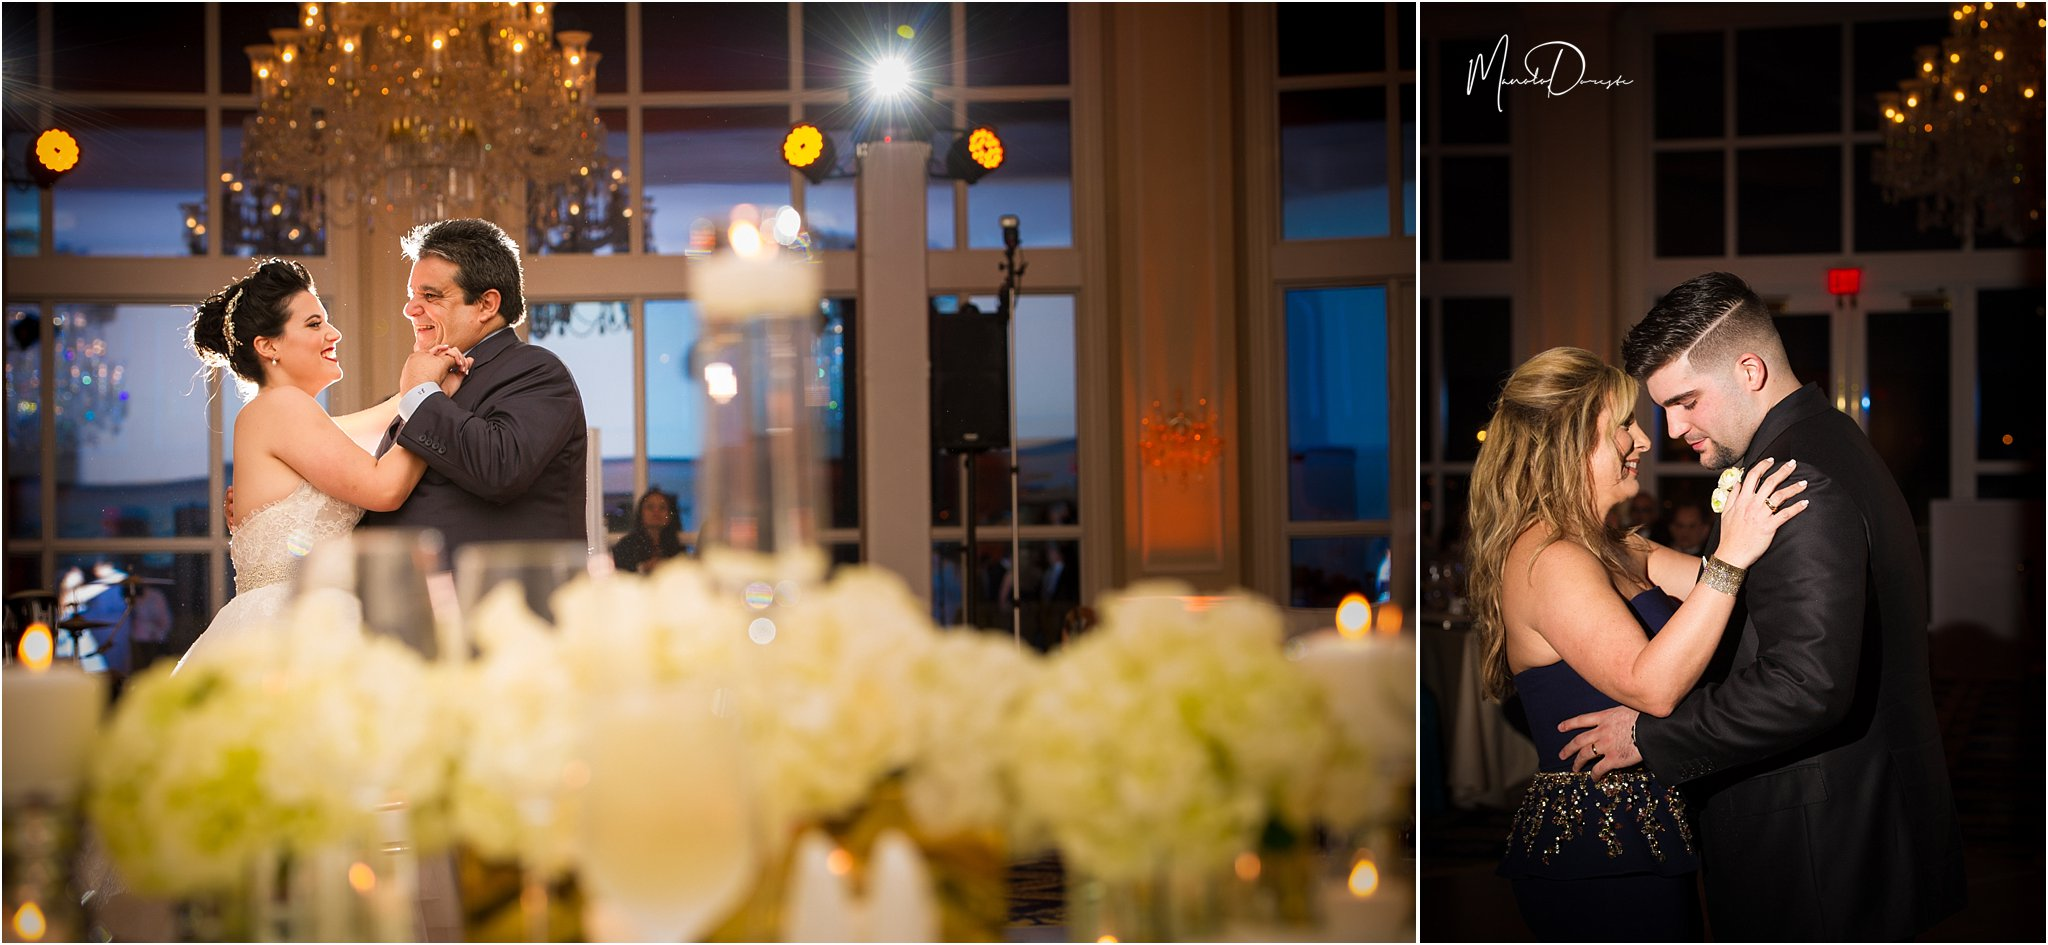 00970_ManoloDoreste_InFocusStudios_Wedding_Family_Photography_Miami_MiamiPhotographer.jpg